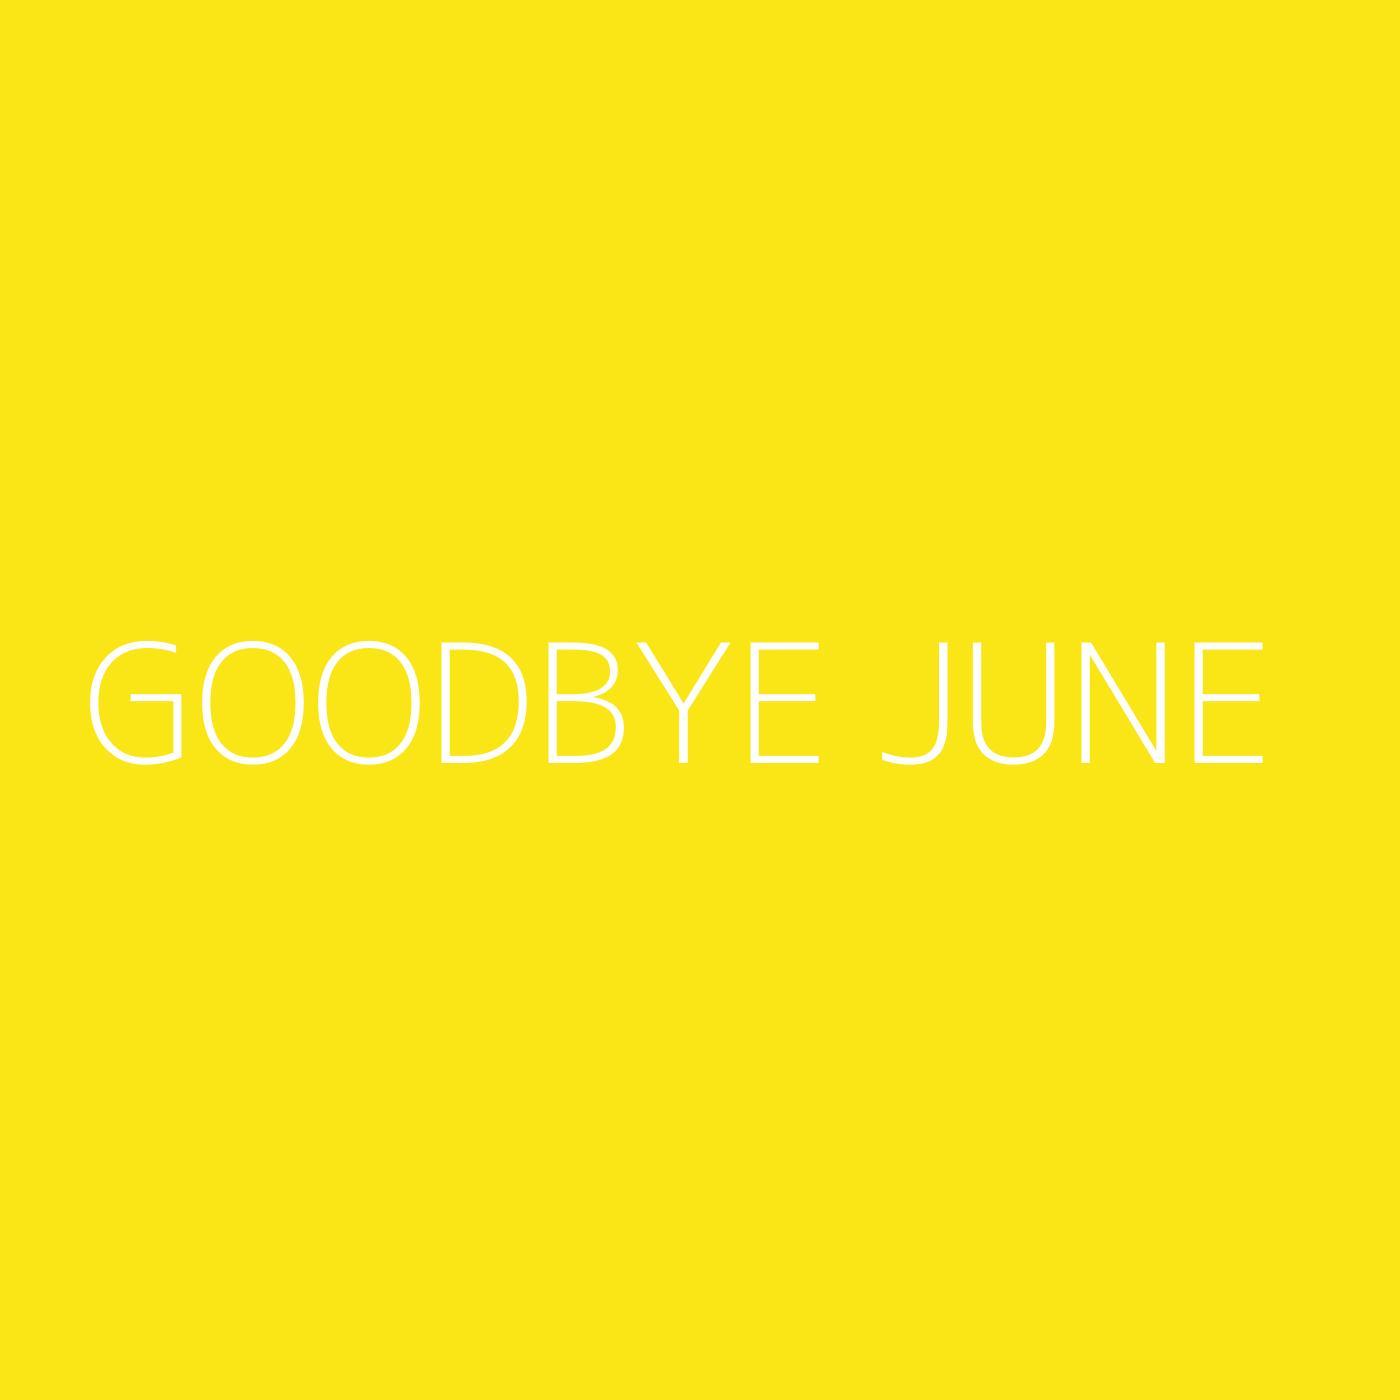 Goodbye June Playlist Artwork